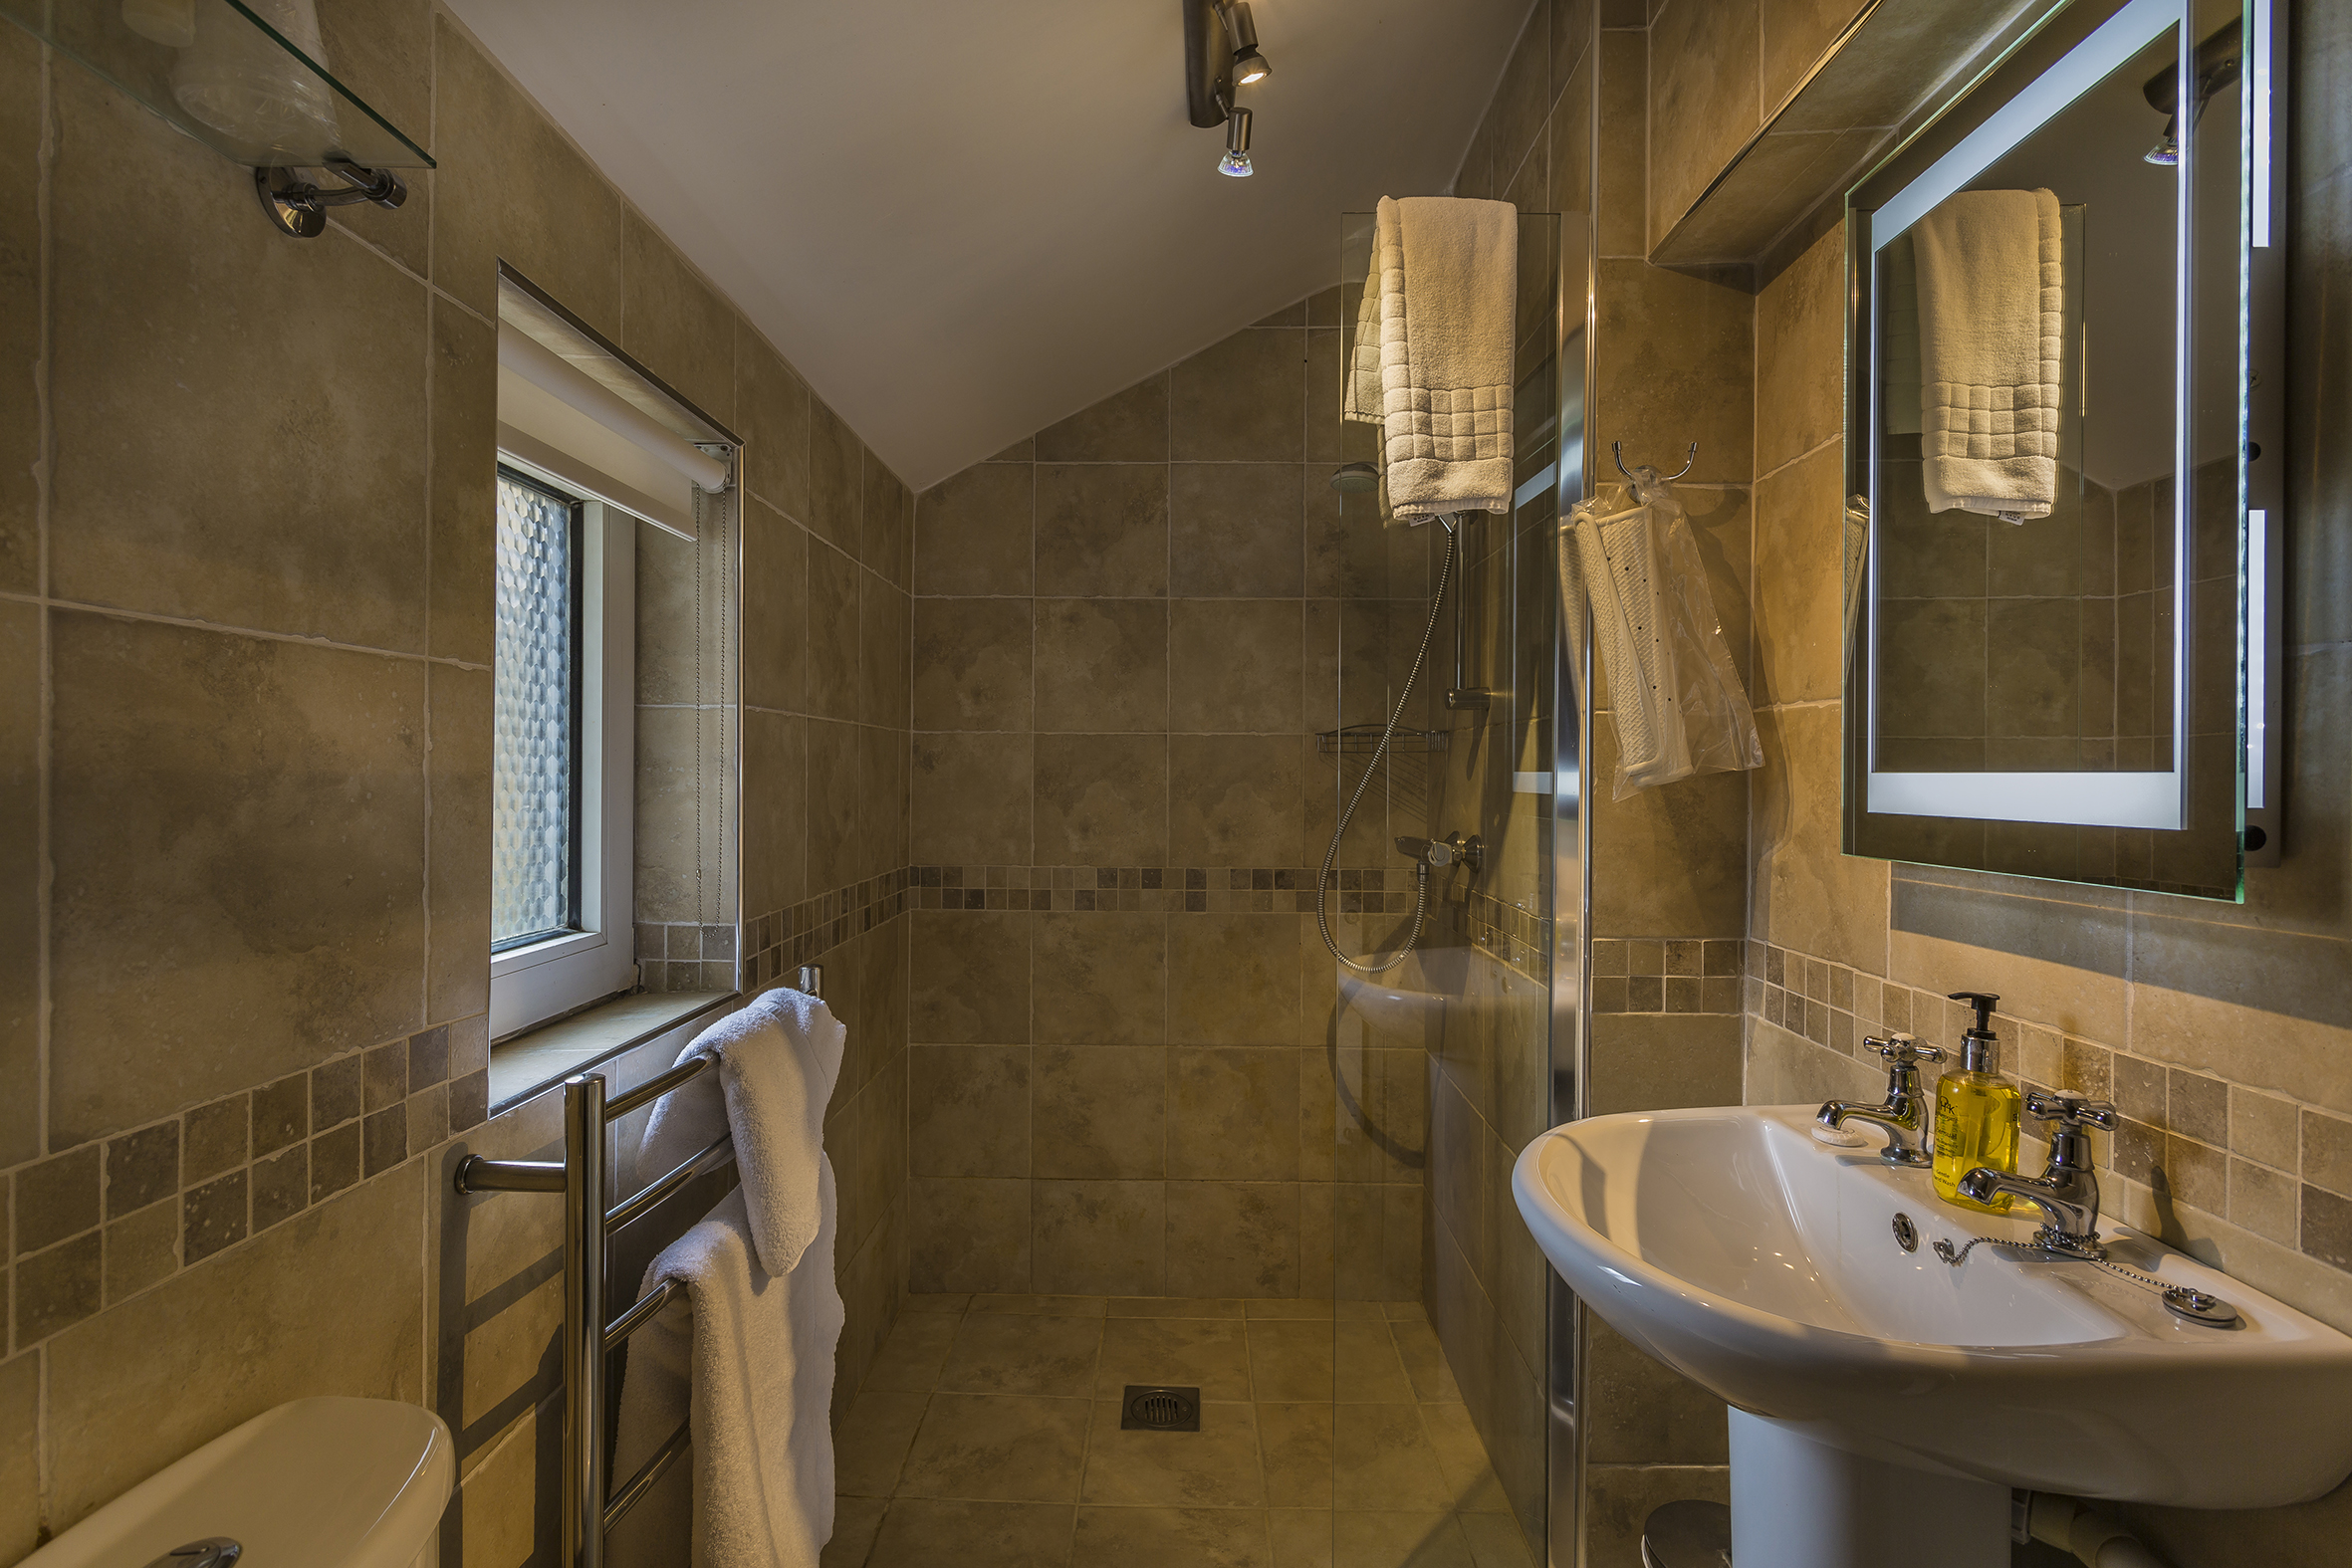 WhiteHartRoyal_Room_117_Bathroom.jpg